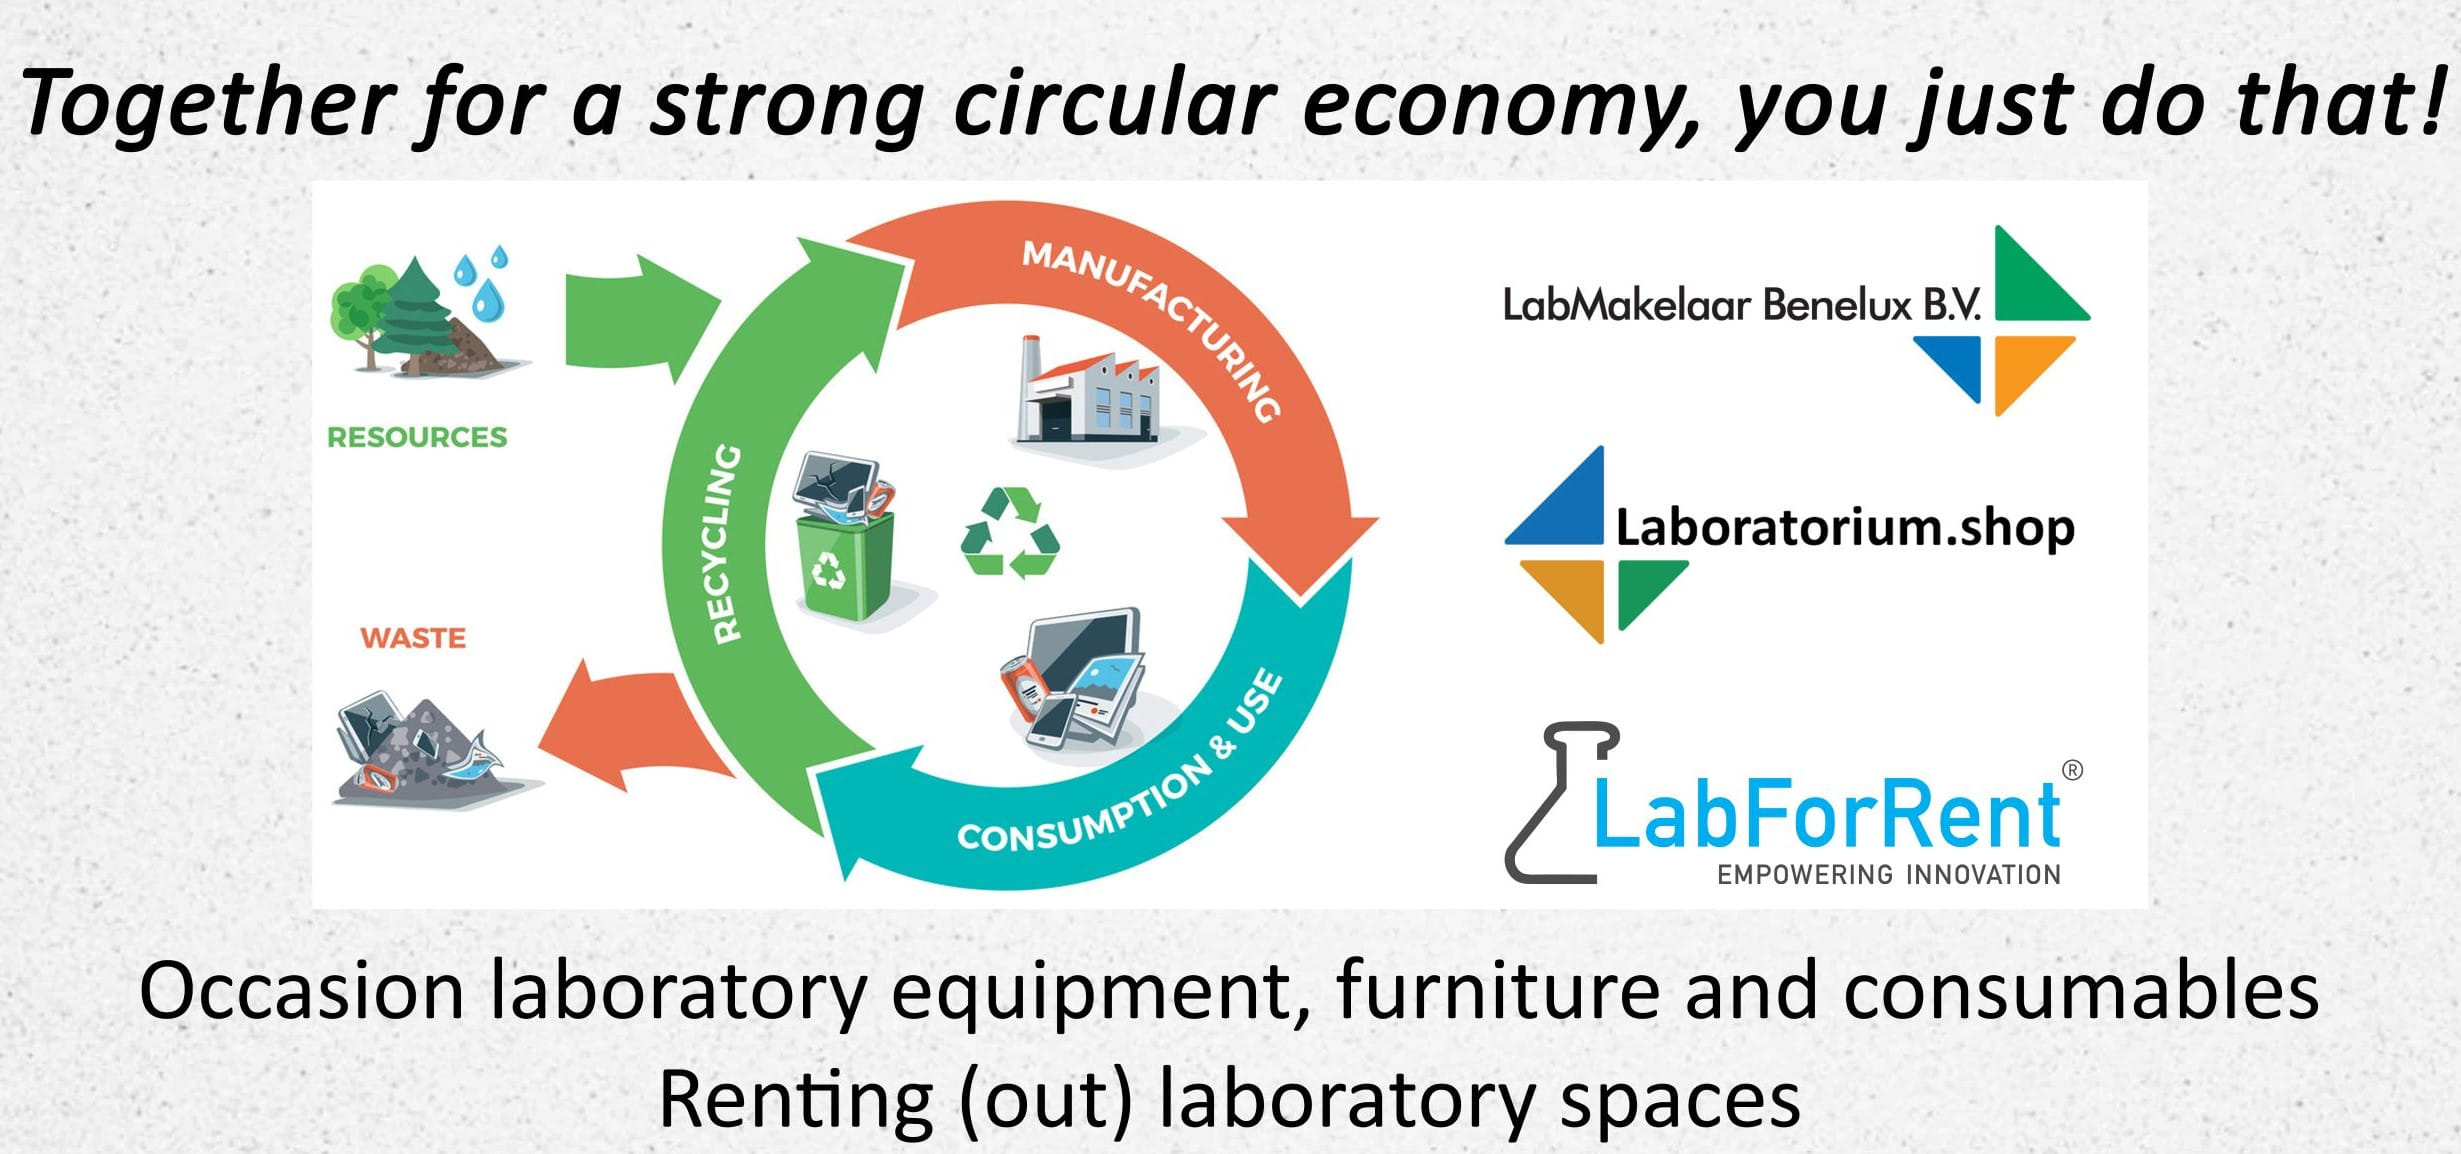 Circular economy LabMakelaar